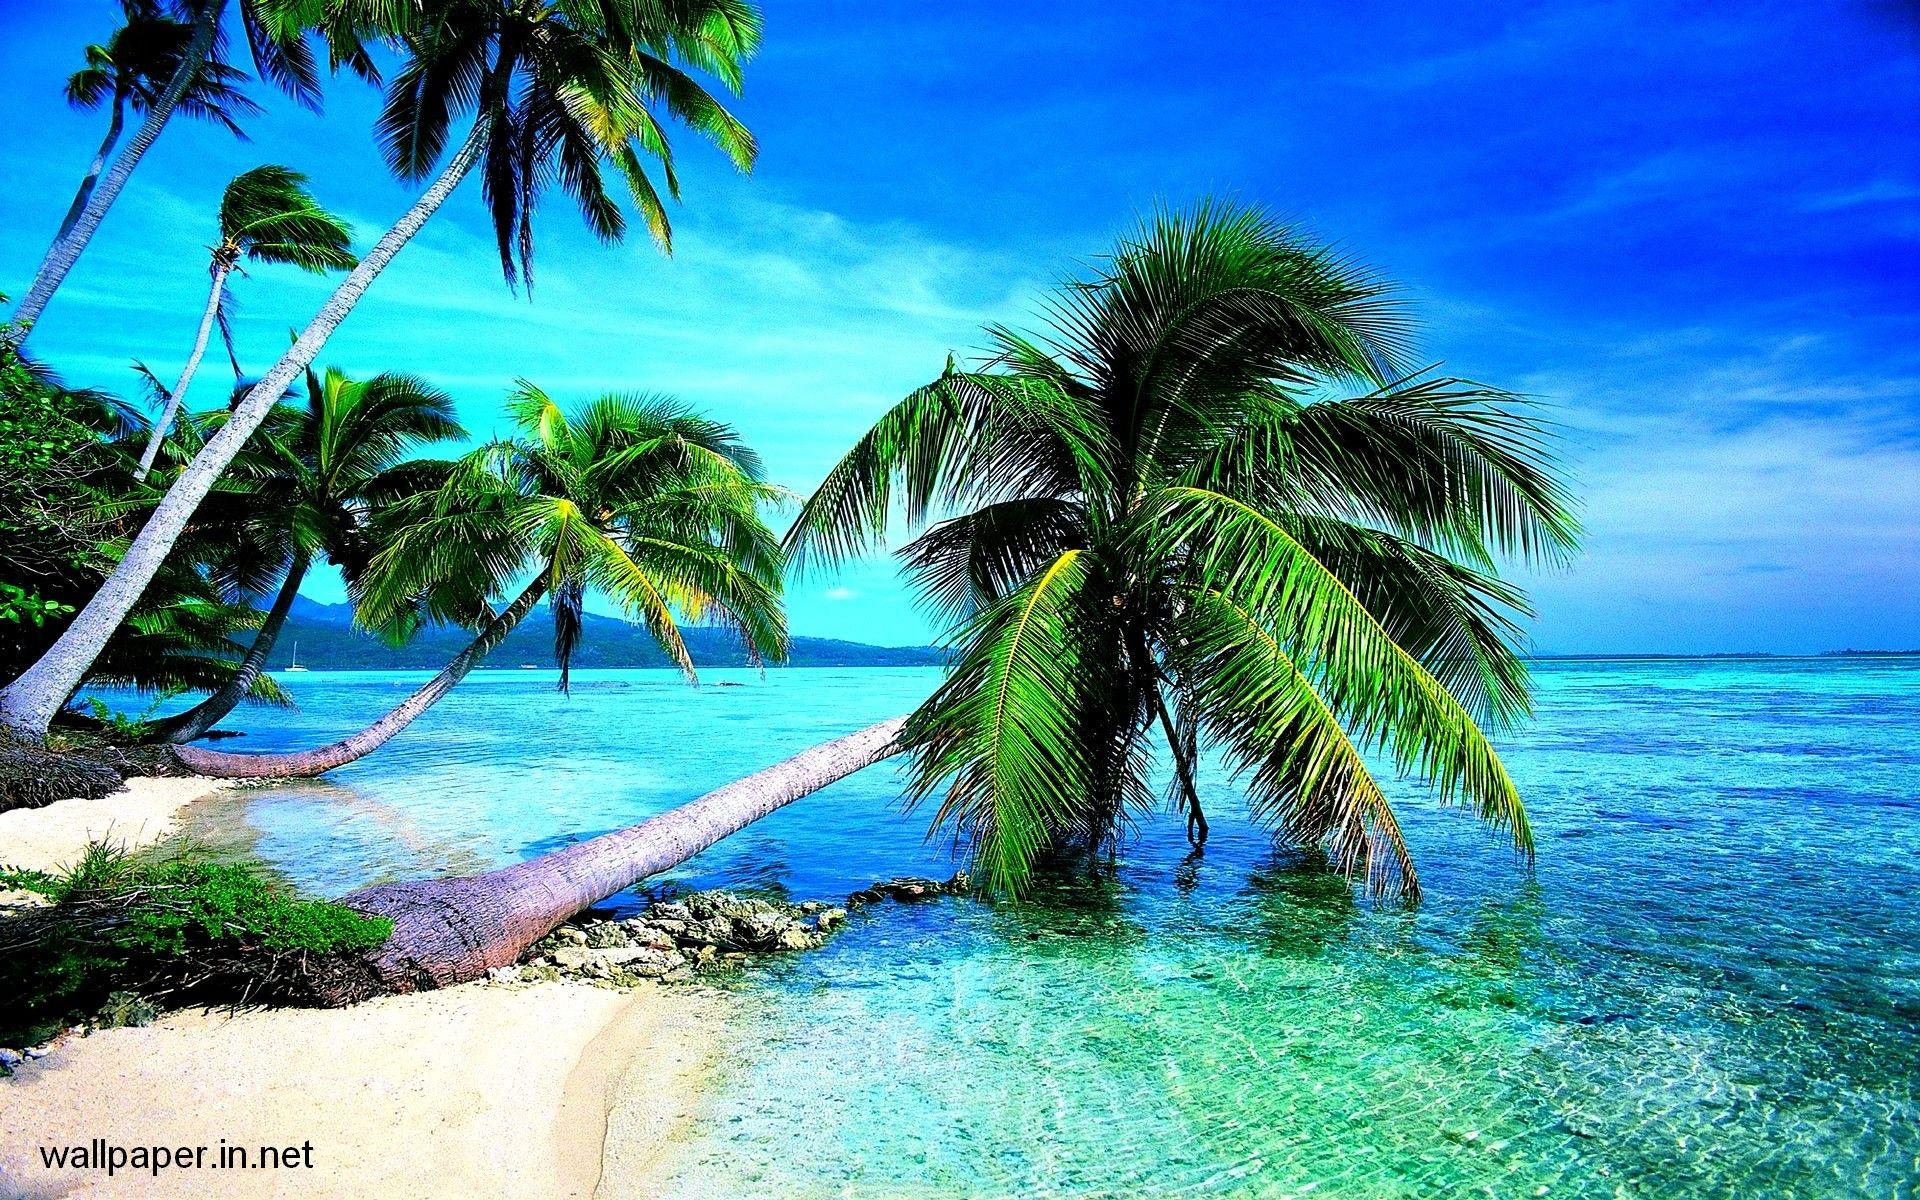 1920x1200 Tropical Island Wallpaper Free Wallpapersafari Tropical Blue Sea Clear Sky White Sand B Beach Wallpaper Hd Wallpapers For Pc Attractive Wallpapers